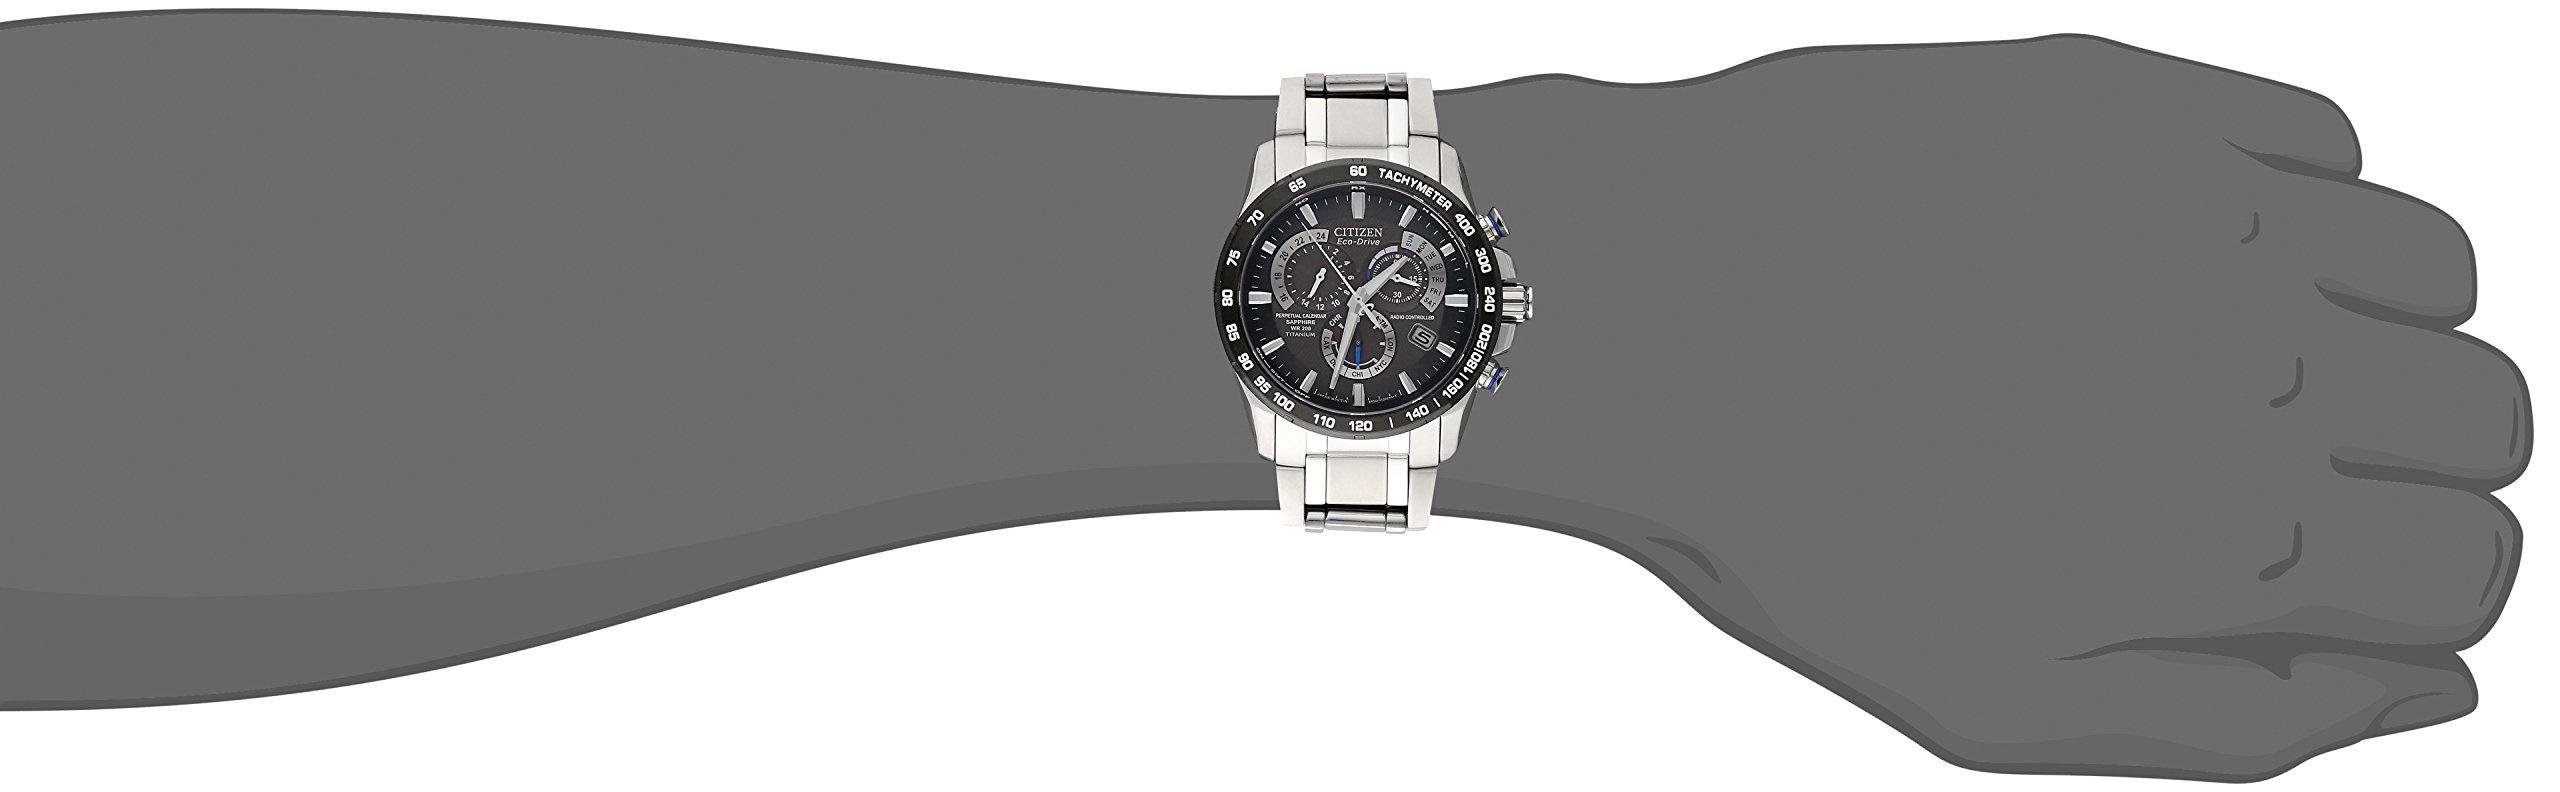 Citizen Eco-Drive Men's AT4010-50E Titanium Perpetual Chrono A-T Watch by Citizen (Image #3)